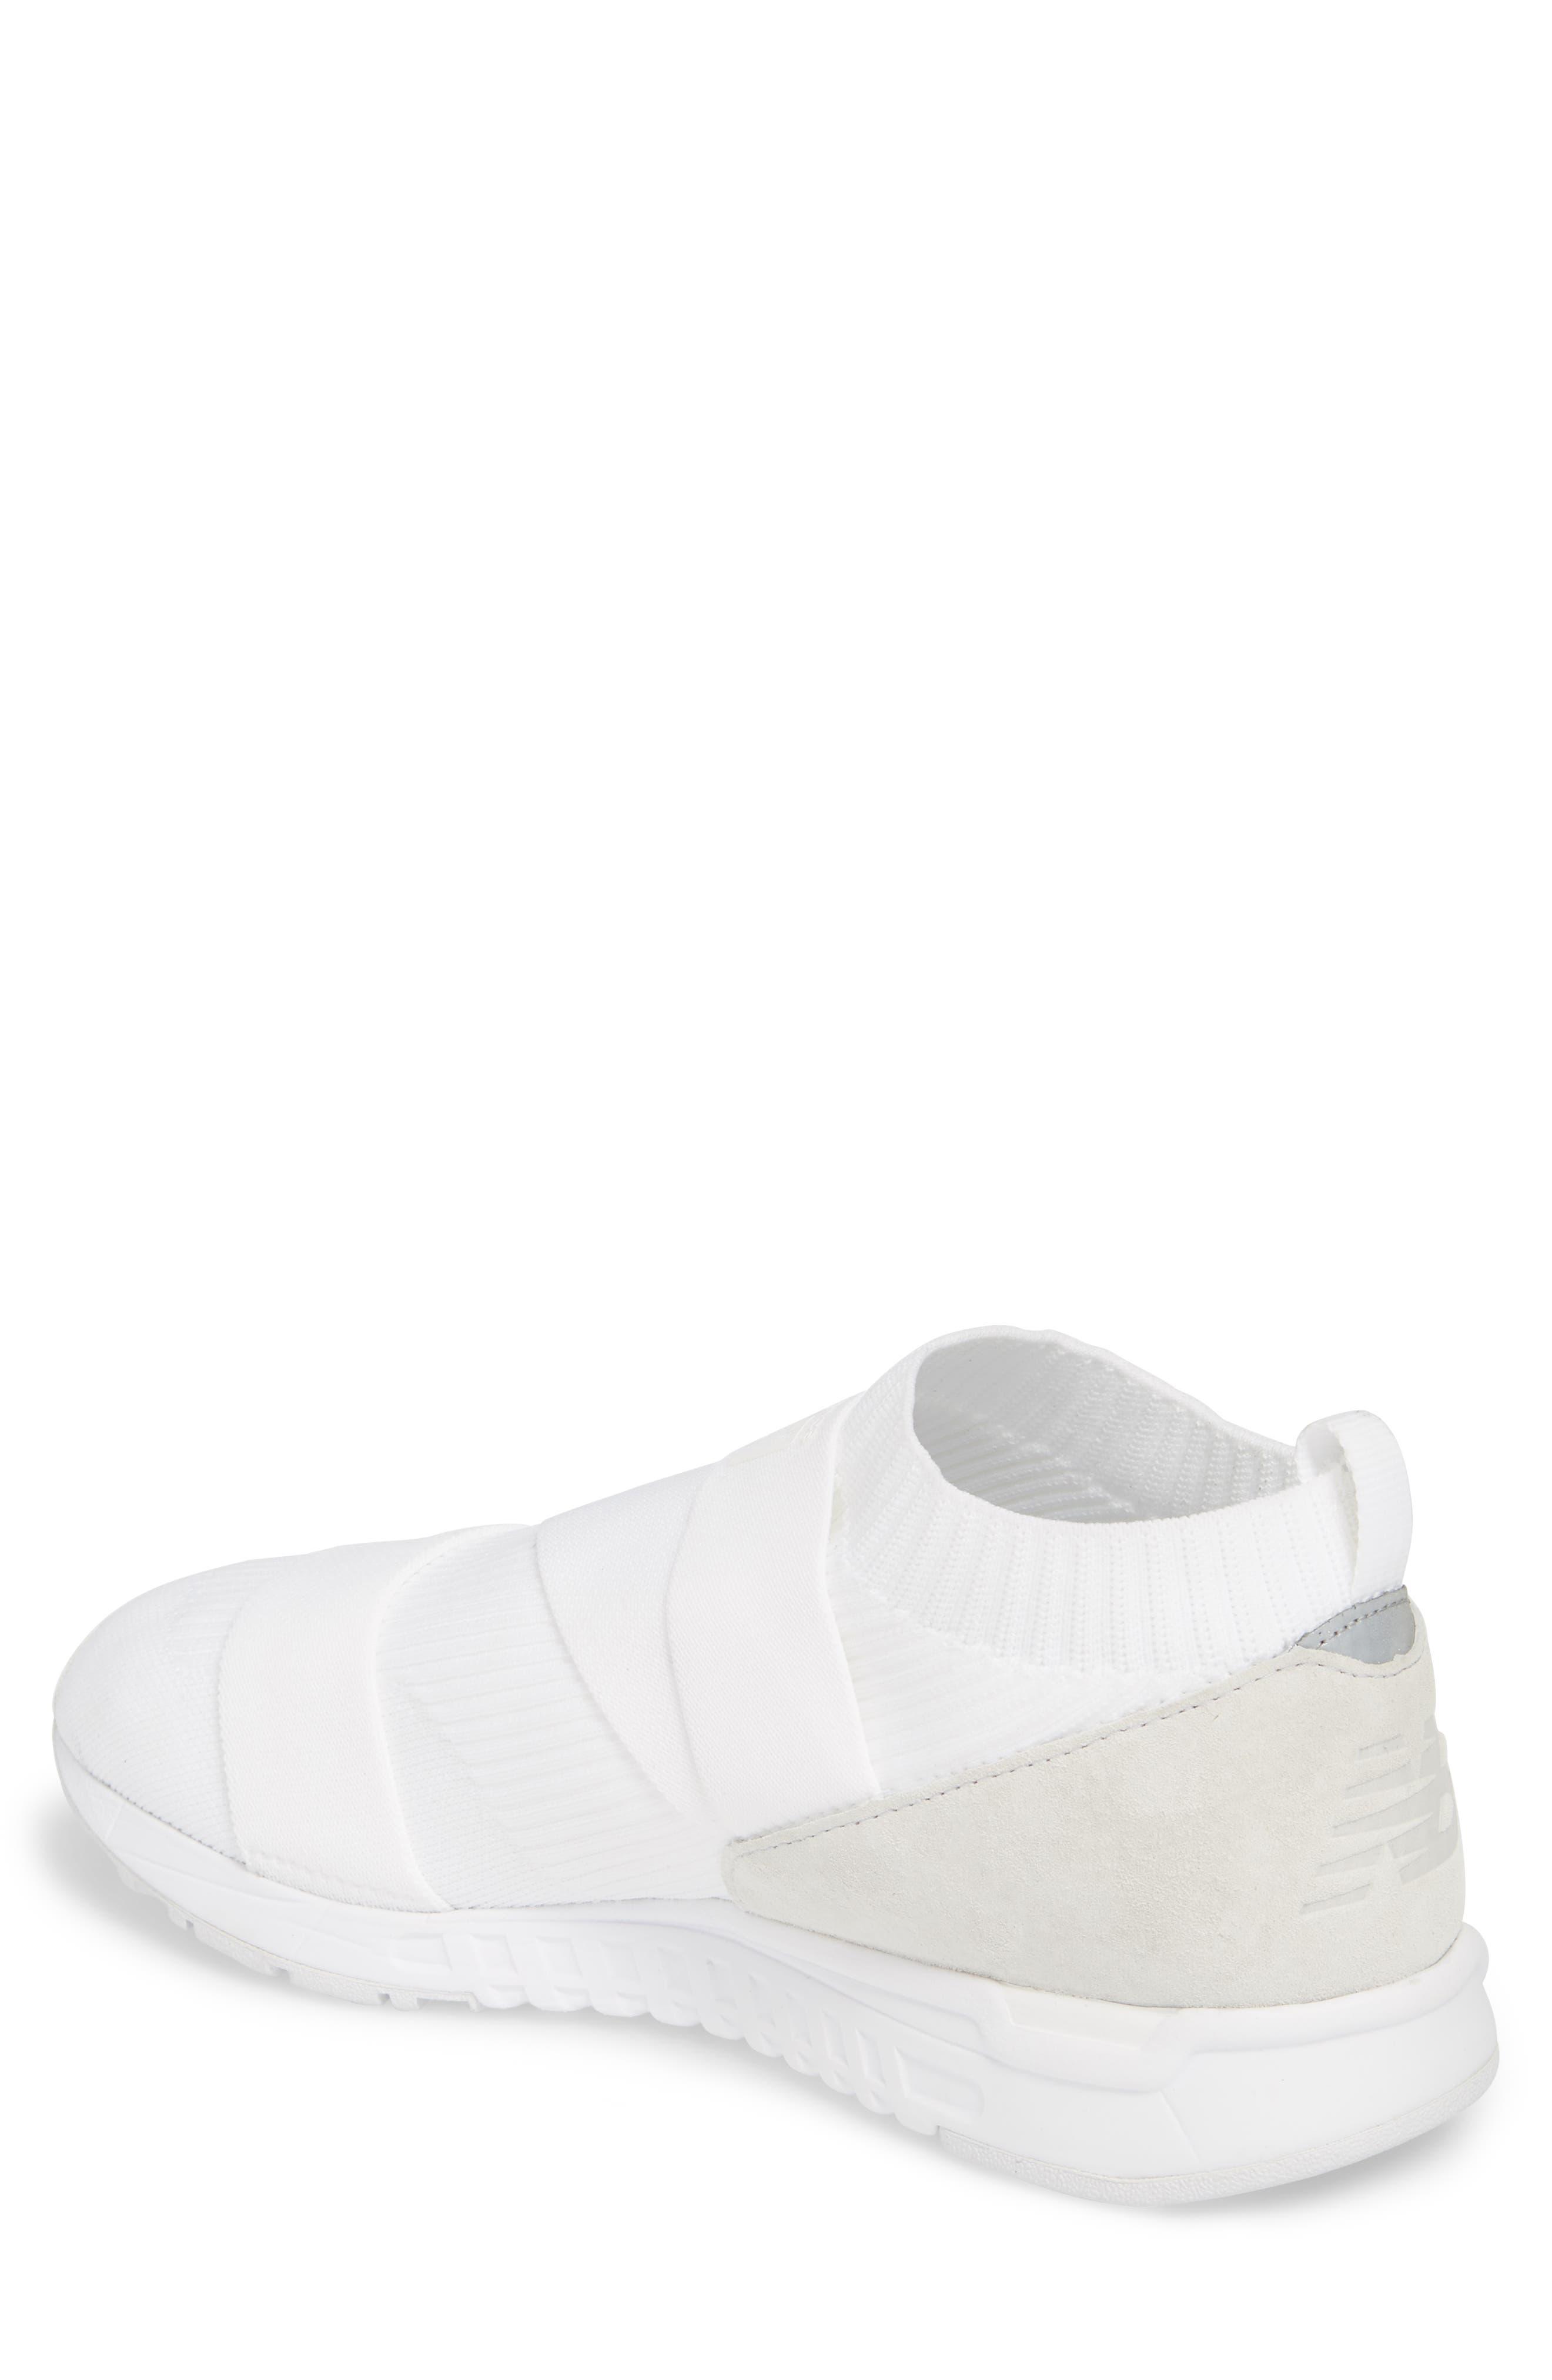 247 Knit Sneaker,                             Alternate thumbnail 2, color,                             WHITE